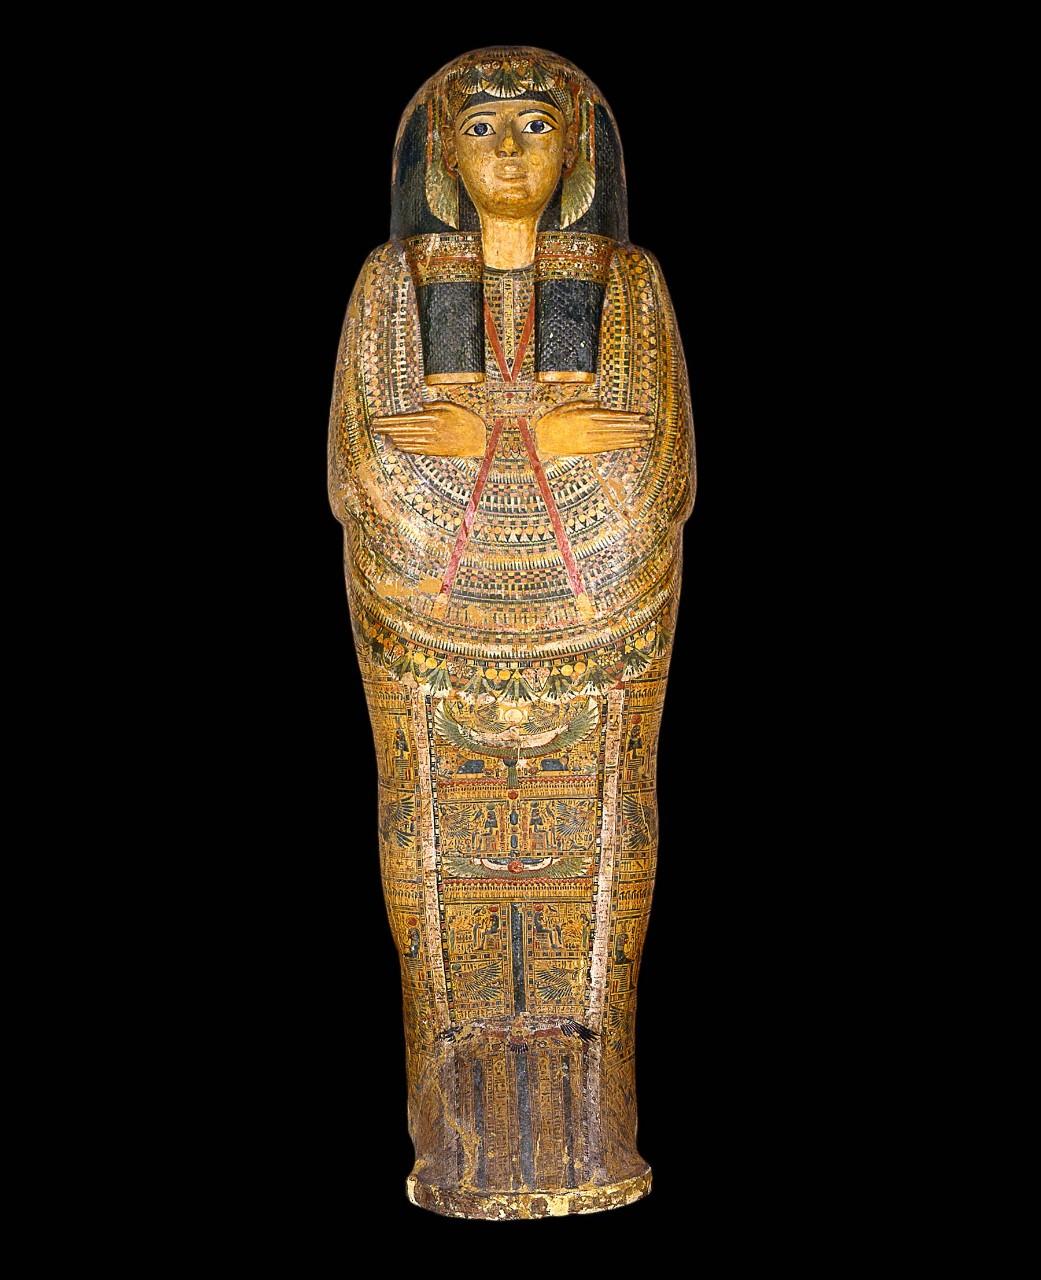 Uncategorized Pictures Of Sarcophagus sarcophagus of djedmut vatican museums sarcophagus